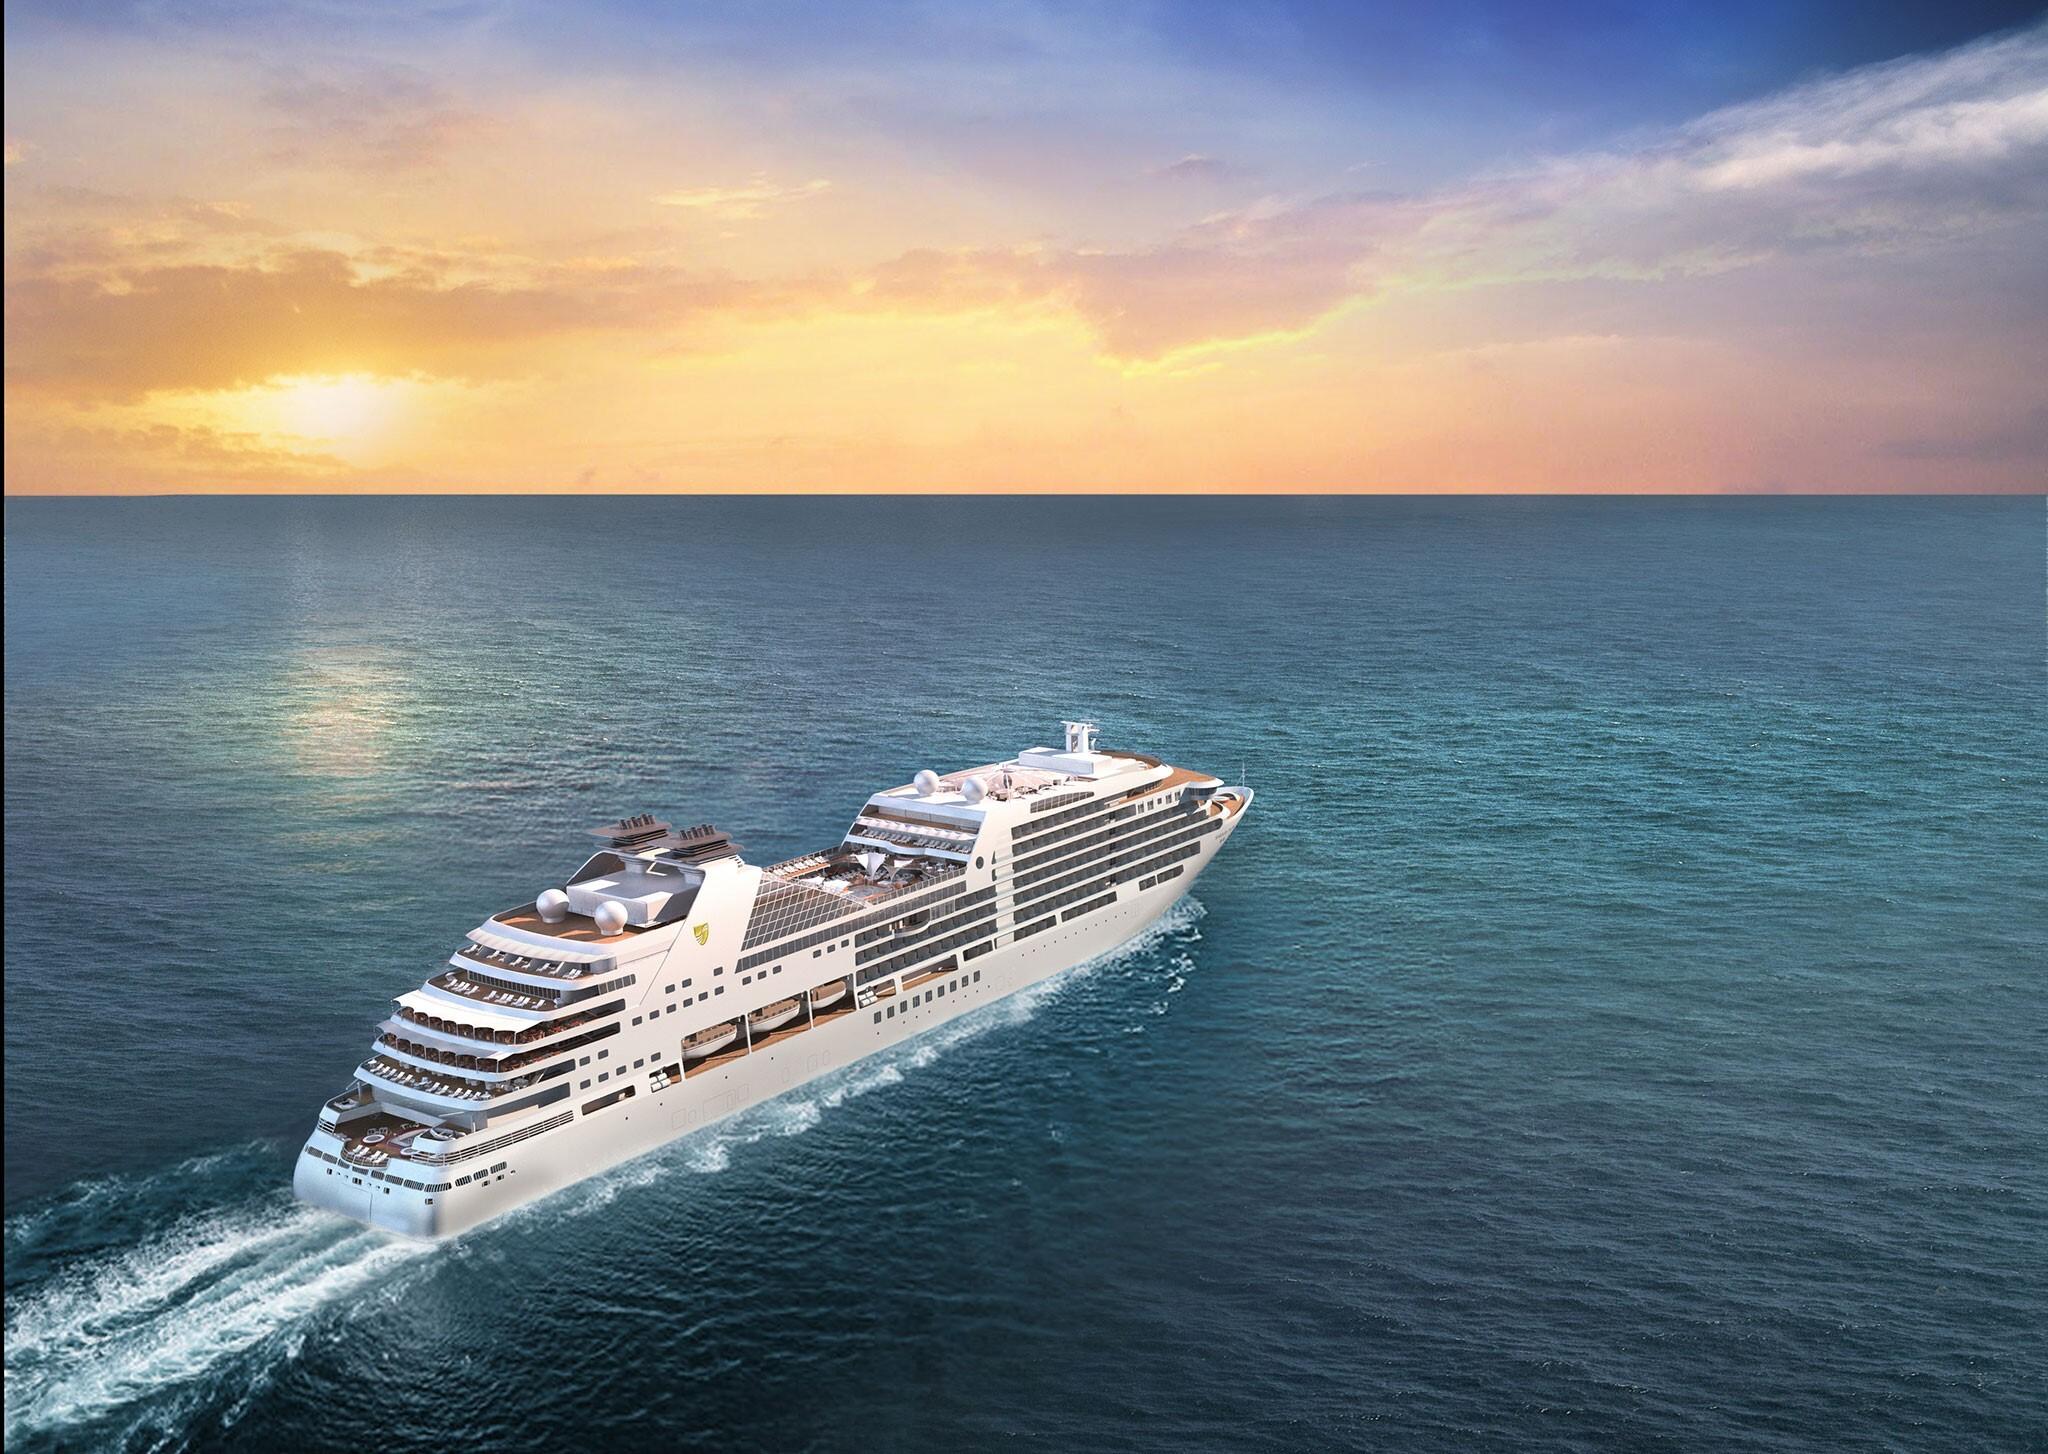 Big Ship In Sea Hd Wallpaper Hd Wallpapers